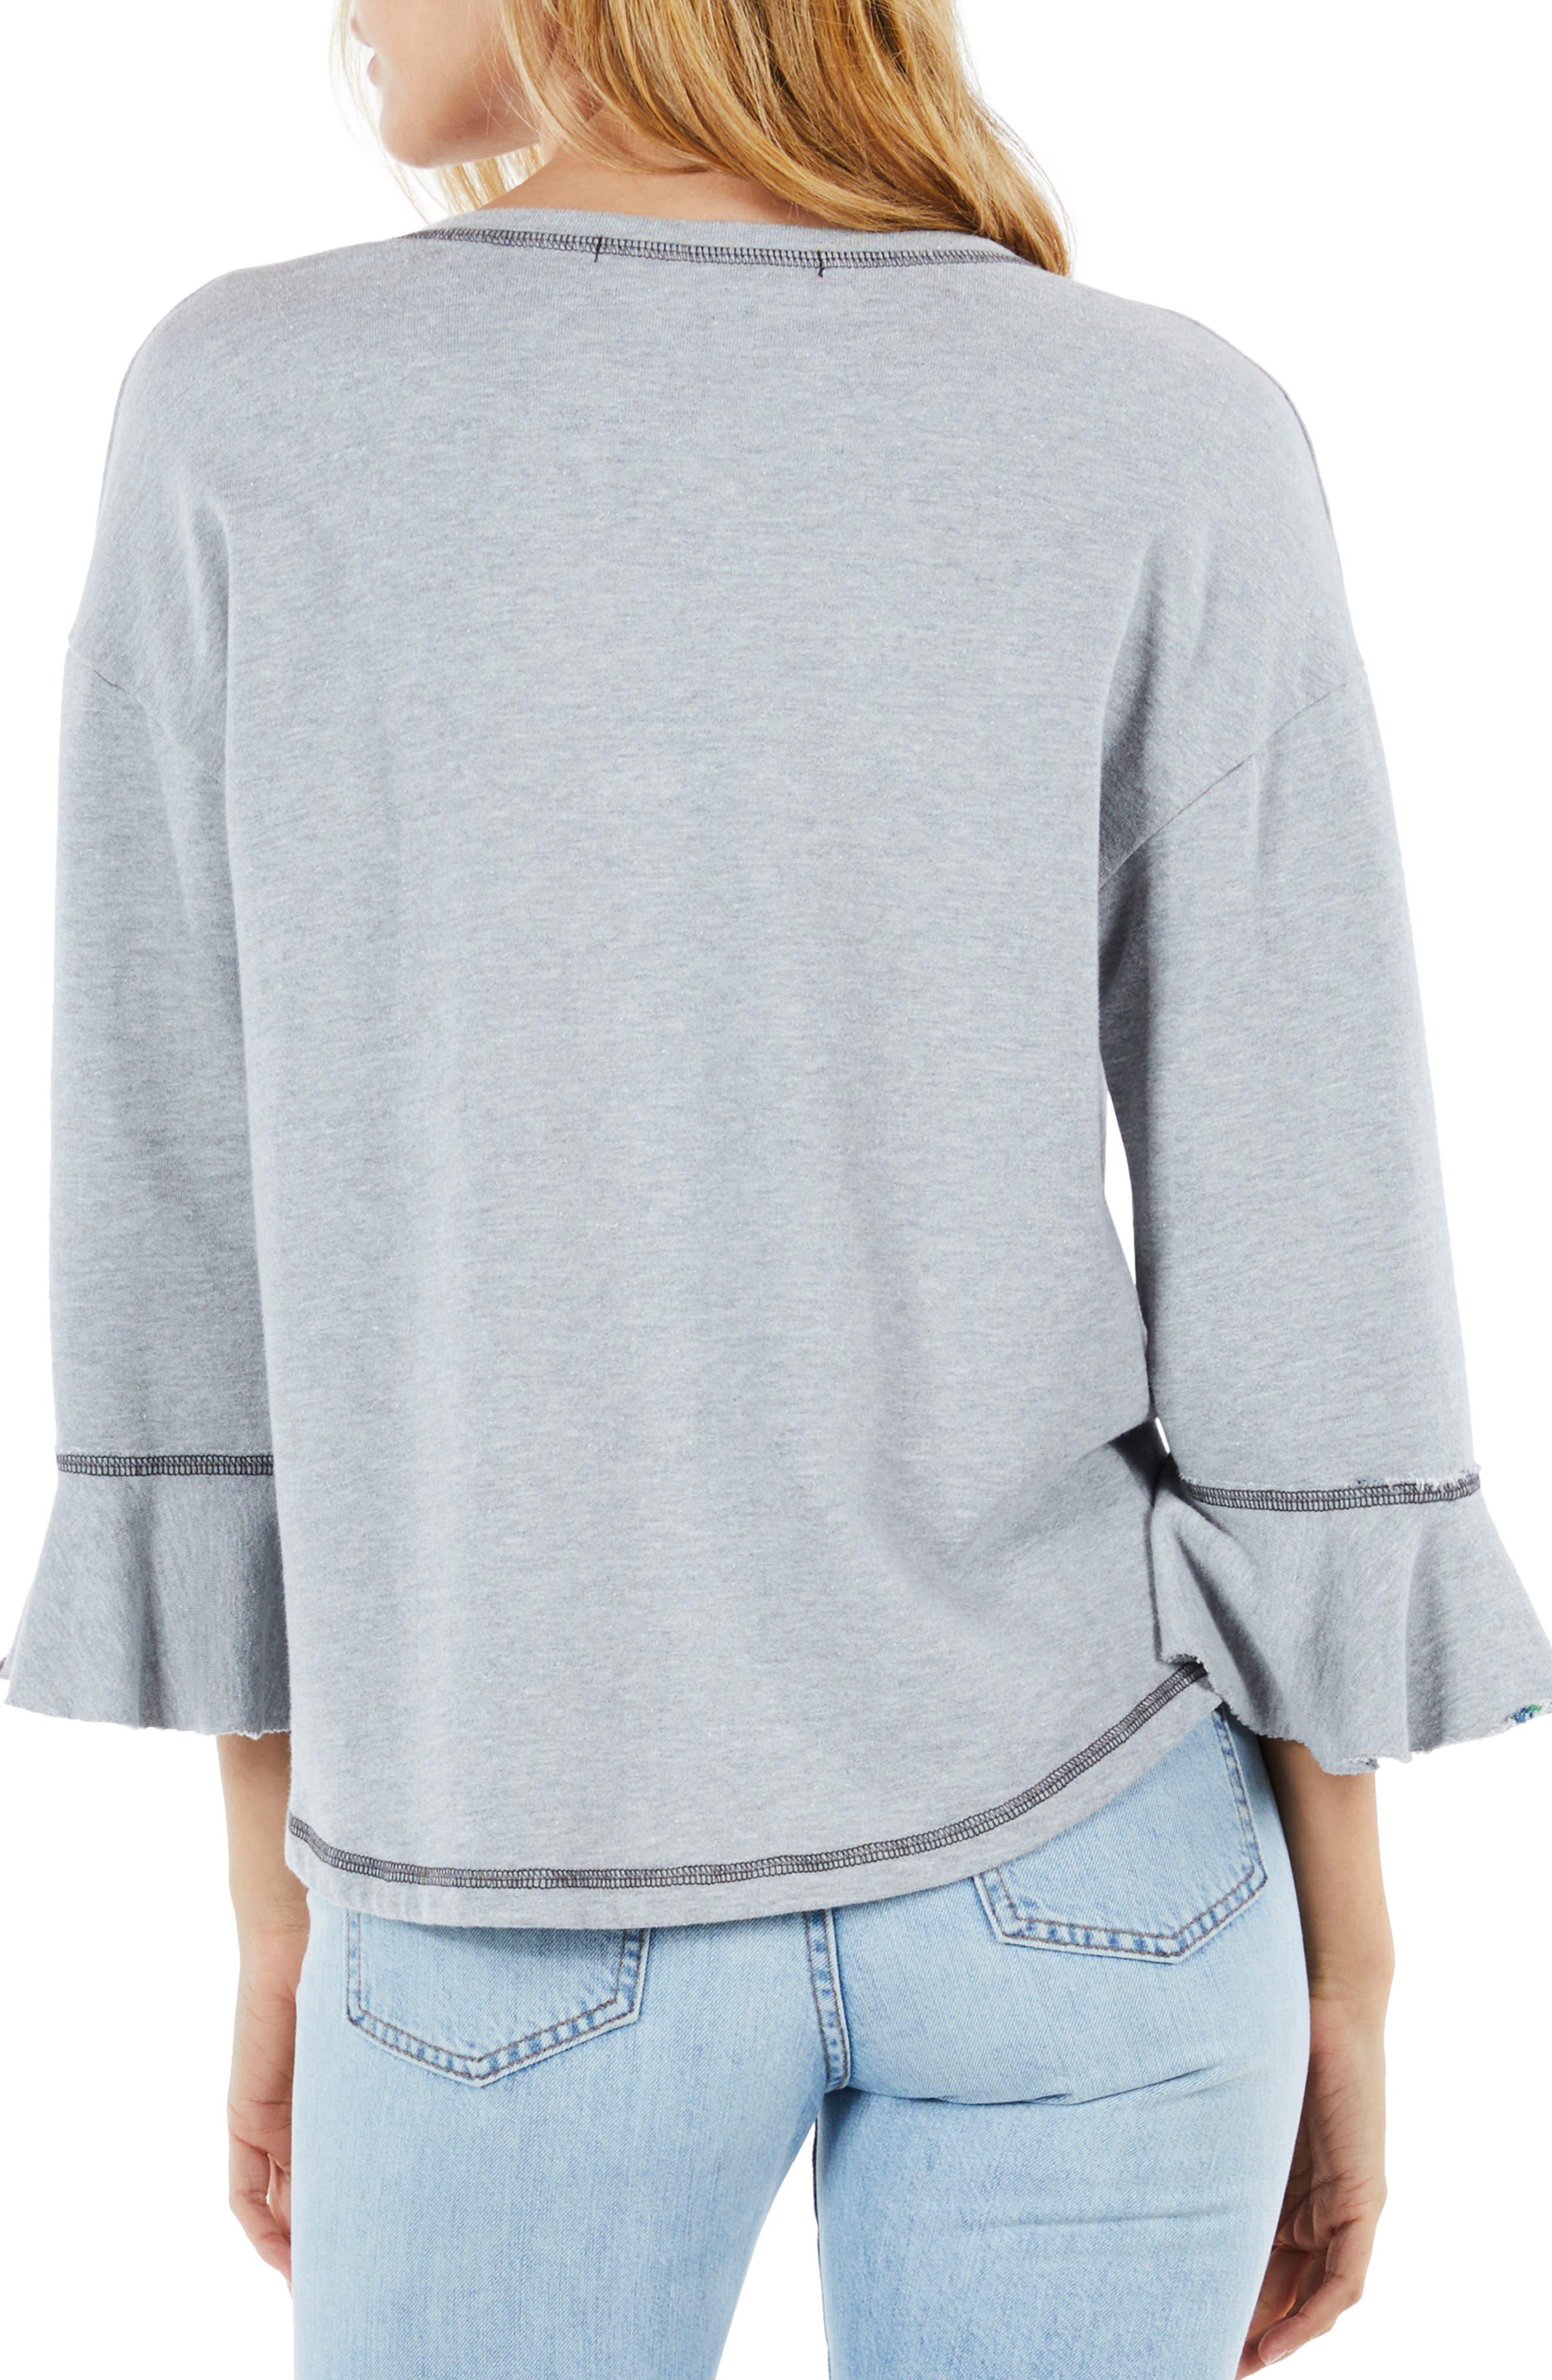 Ruffle Sleeve Reversible Sweatshirt,                             Alternate thumbnail 3, color,                             036